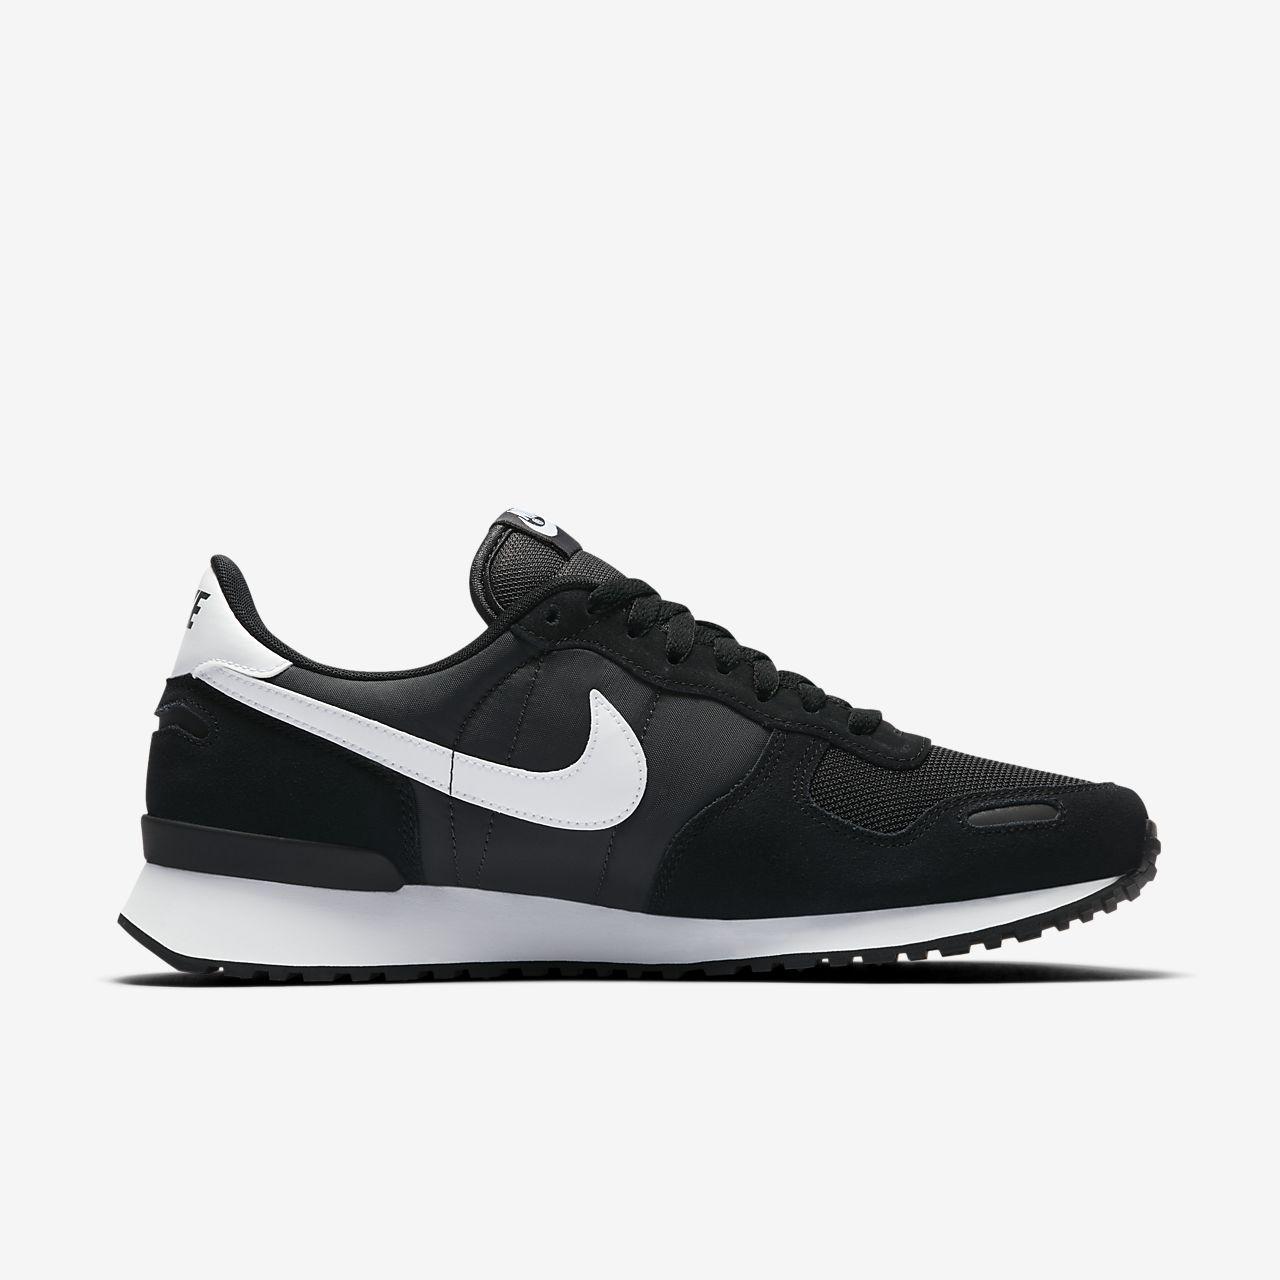 0f89a08672c Nike Air Vortex Herenschoen. Nike.com BE